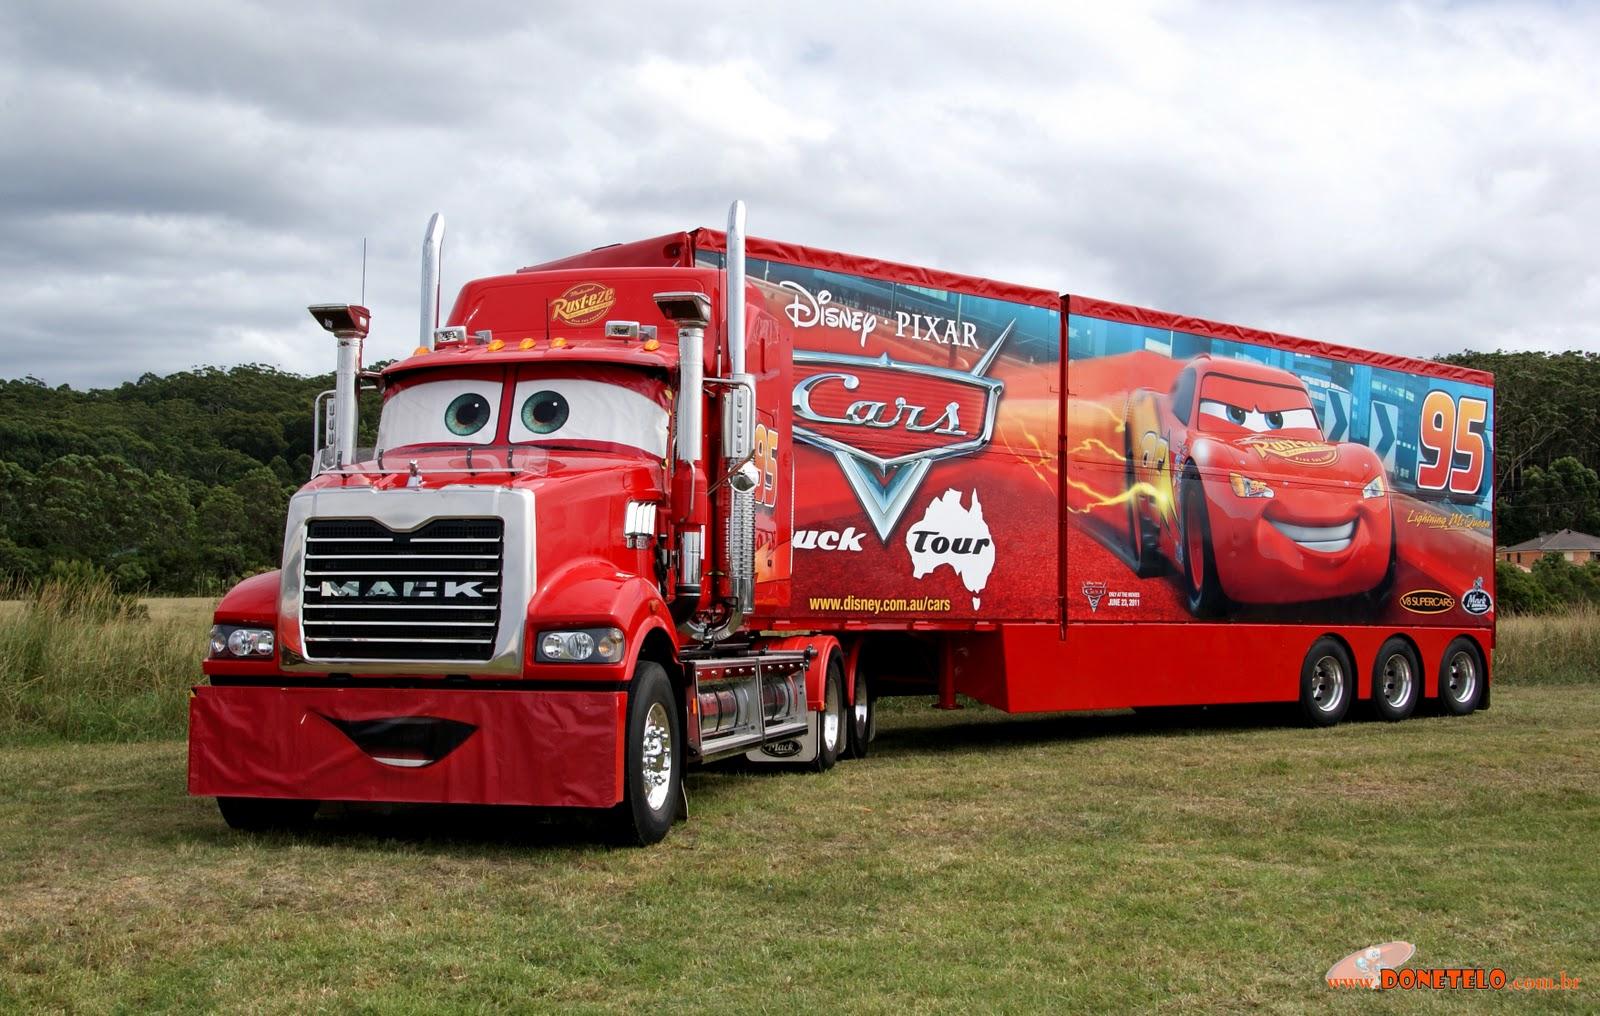 Tractor Trailer Computer : Donetelo caminhões tunados parte fotos